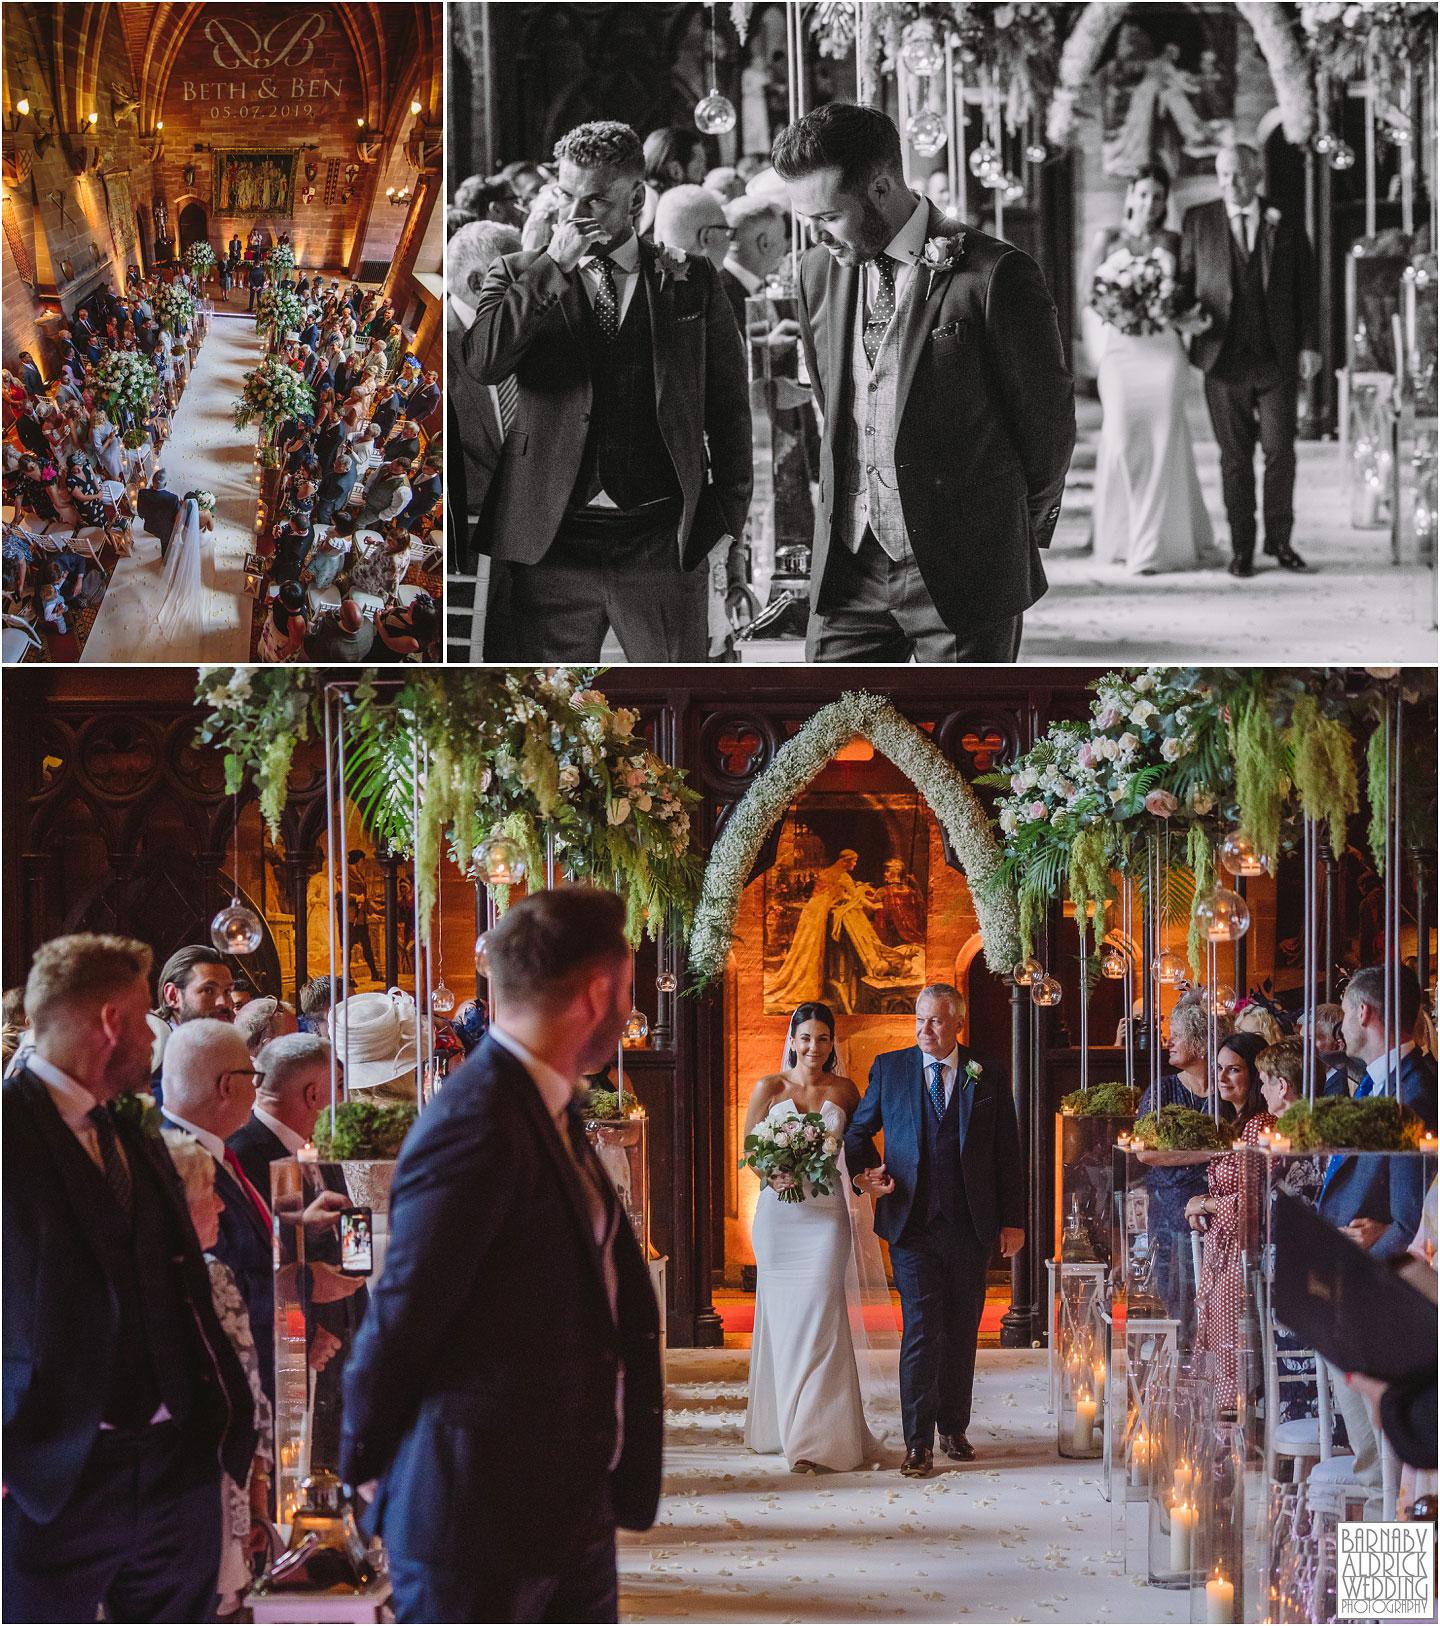 Wedding ceremony at Peckforton Castle, Cheshire Wedding Photography at Peckforton Castle, Peckforton Castle Wedding, UK Castle Wedding